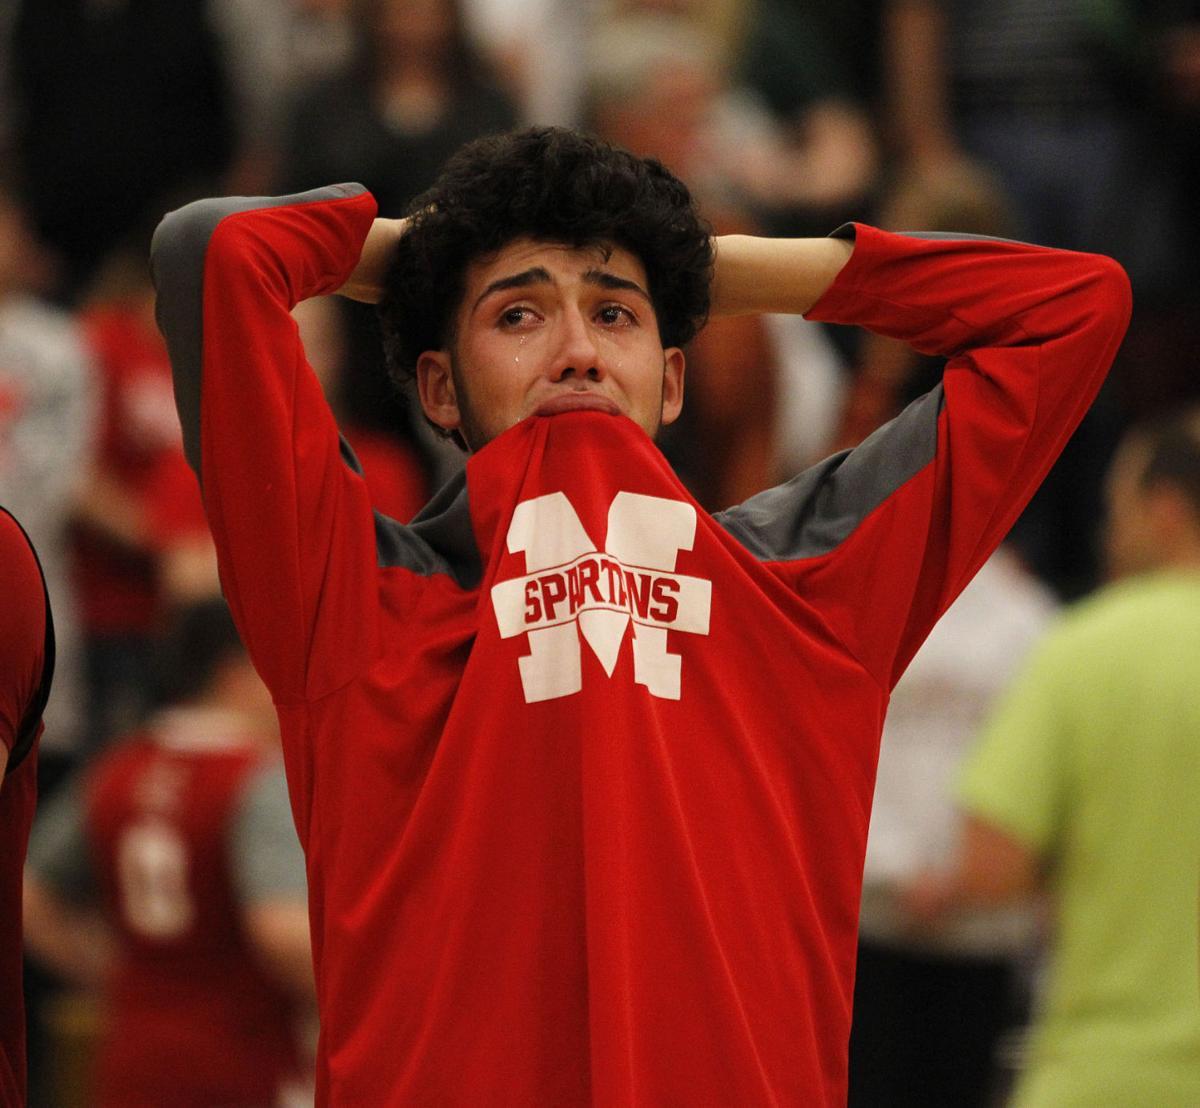 Boys Basketball - Minico Vs. Bishop Kelly